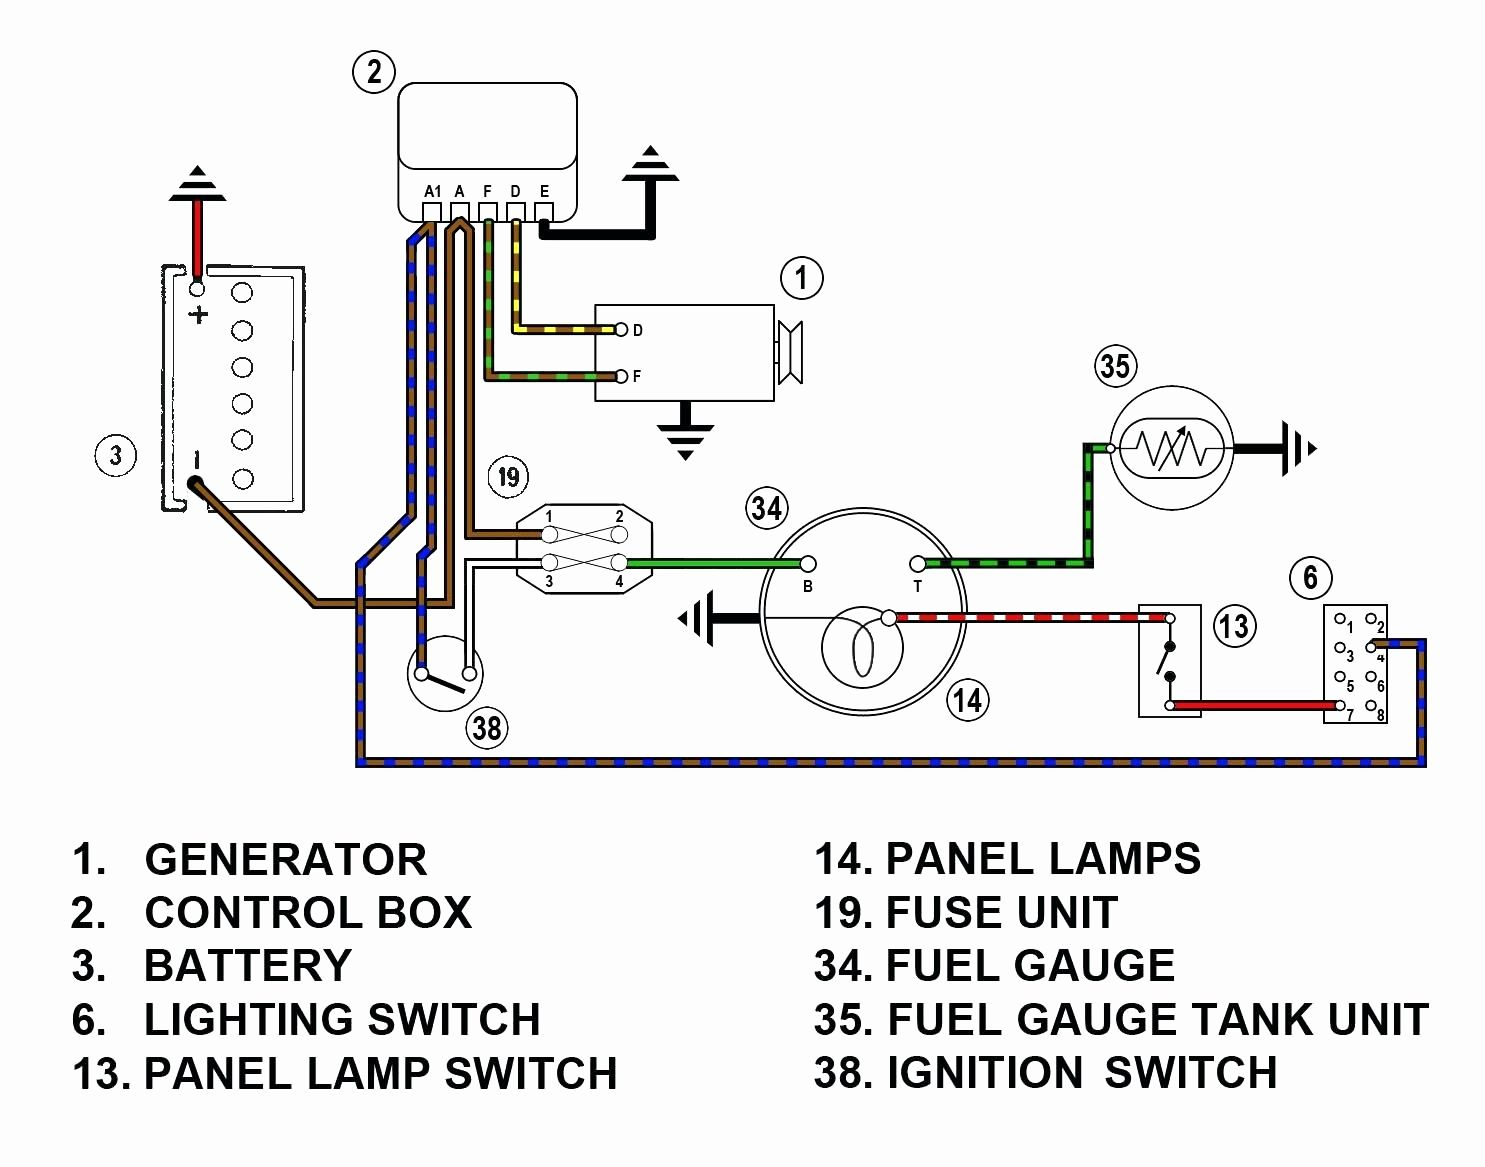 Sunpro Super Tach Ii Wiring | Wiring Diagram - Sunpro Tach Wiring Diagram